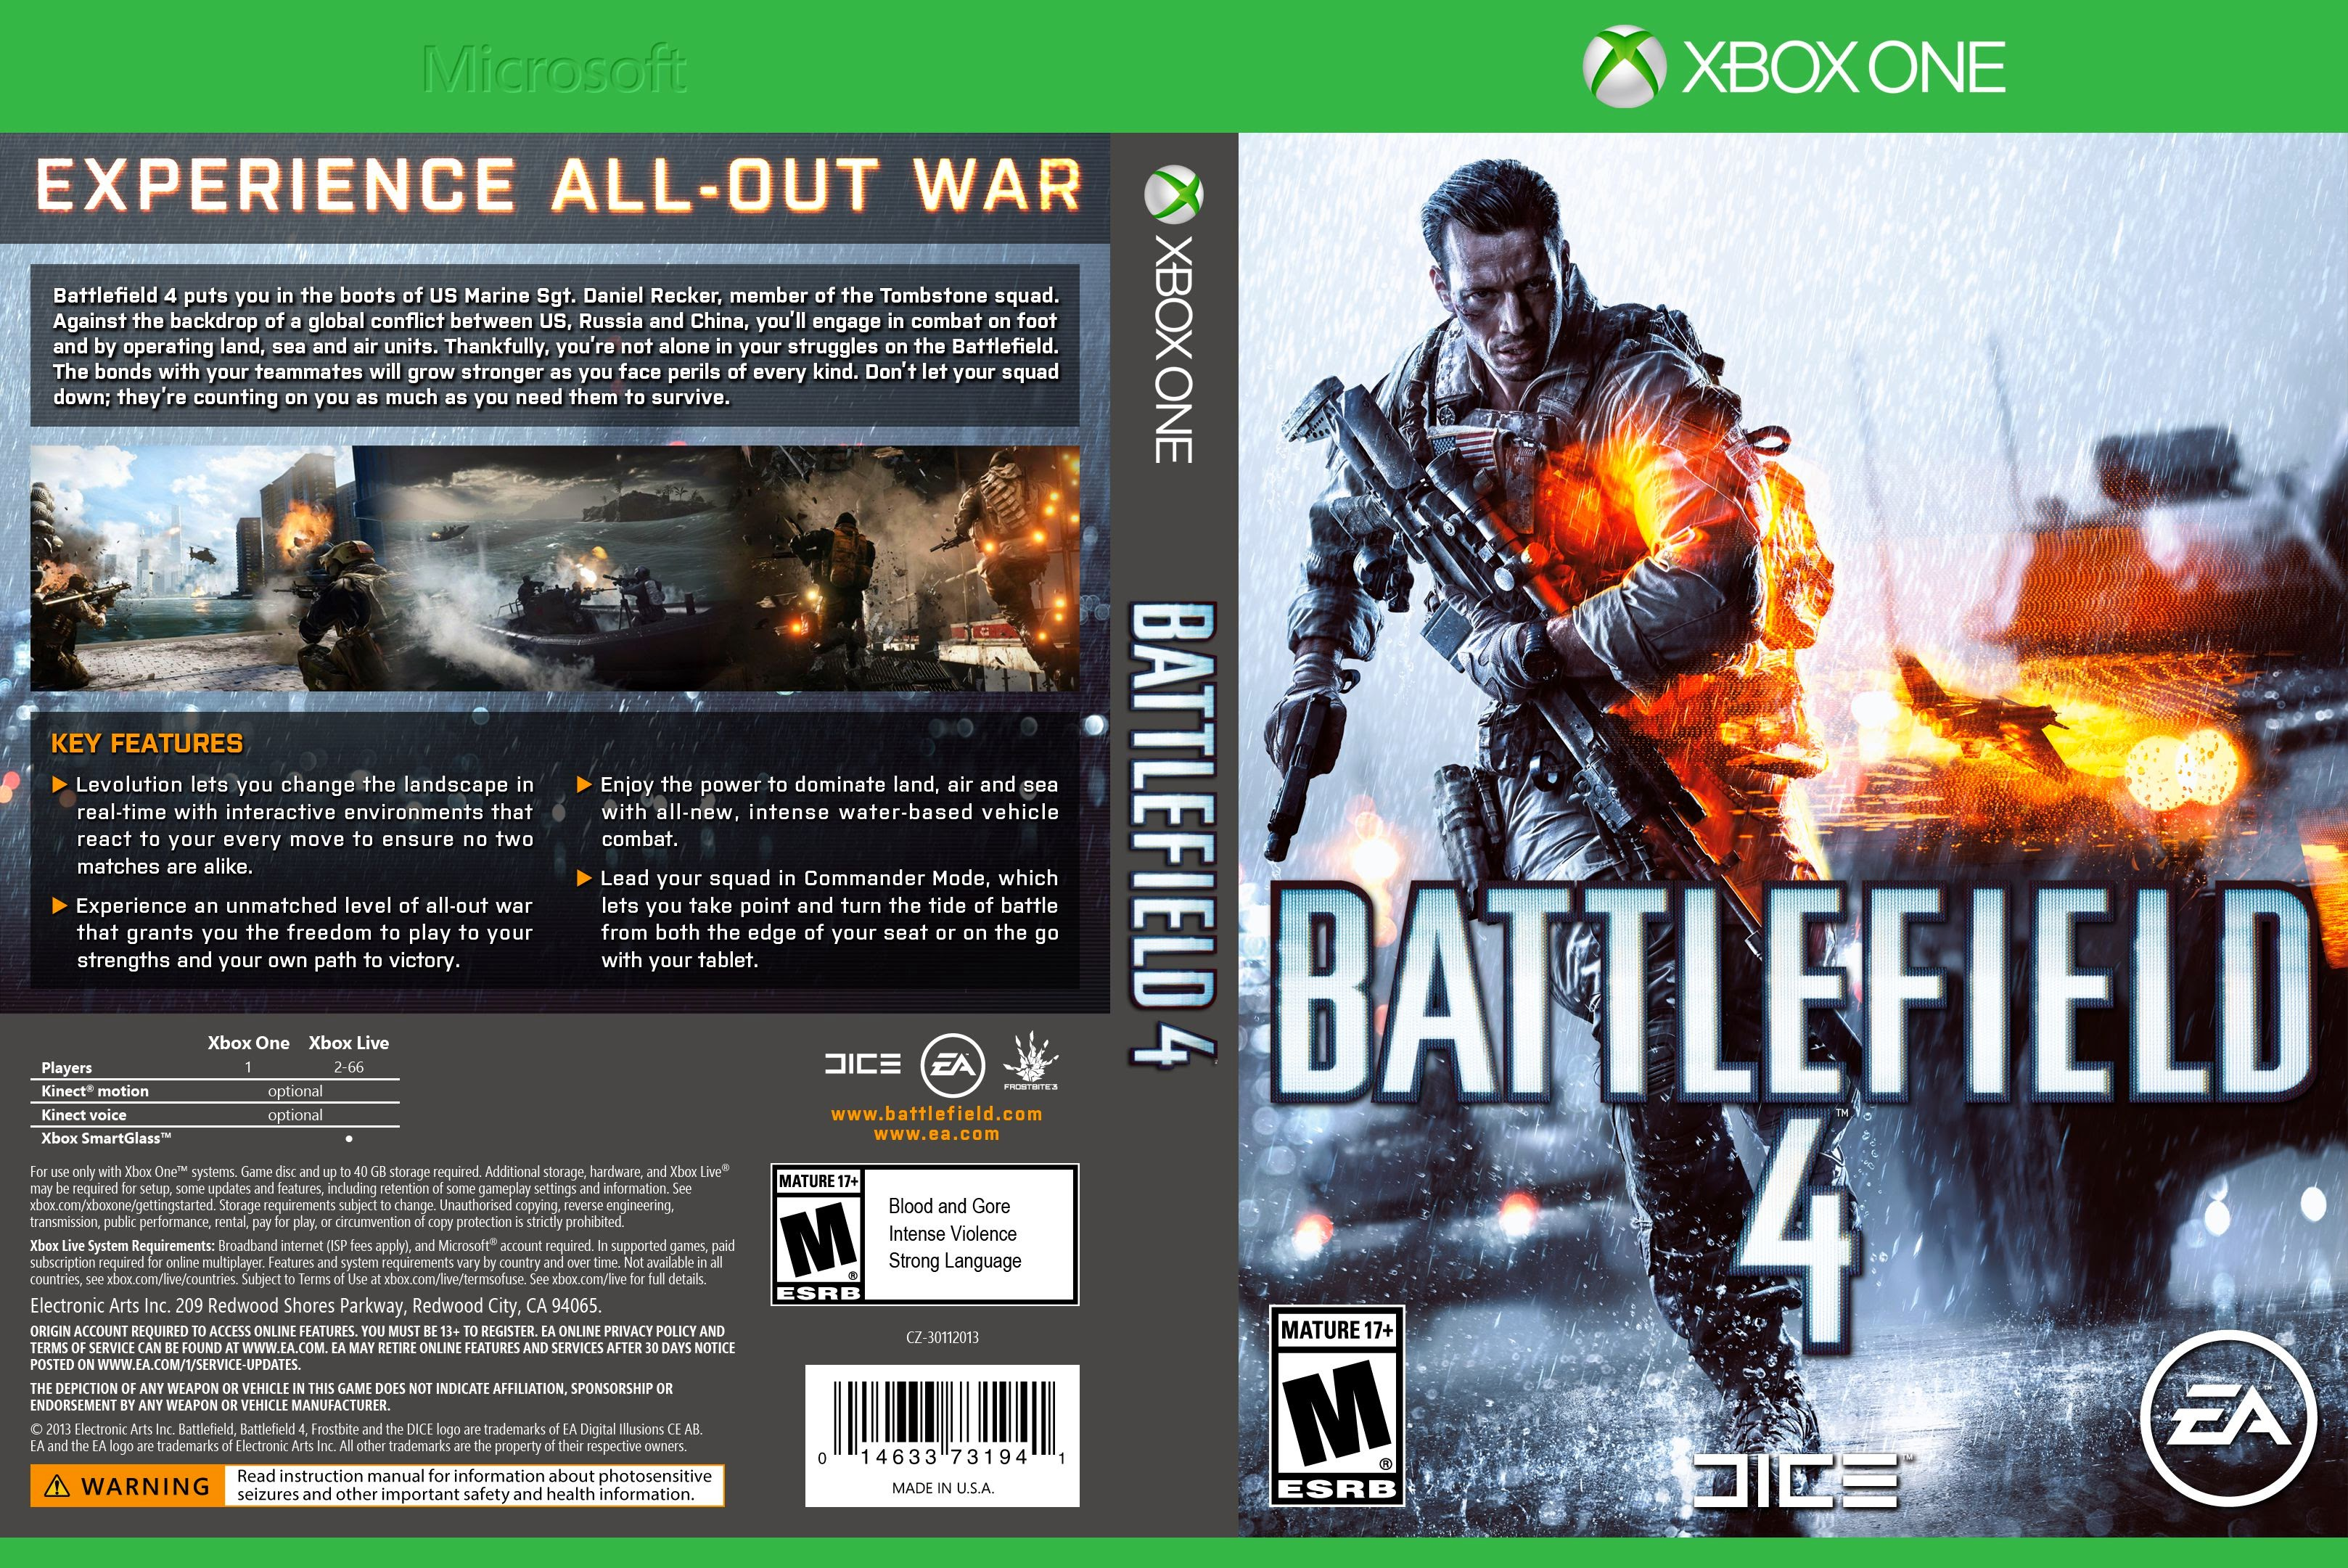 Battlefield4 XboxOne Cover NTSC-DVD jpgXbox One Battlefield 4